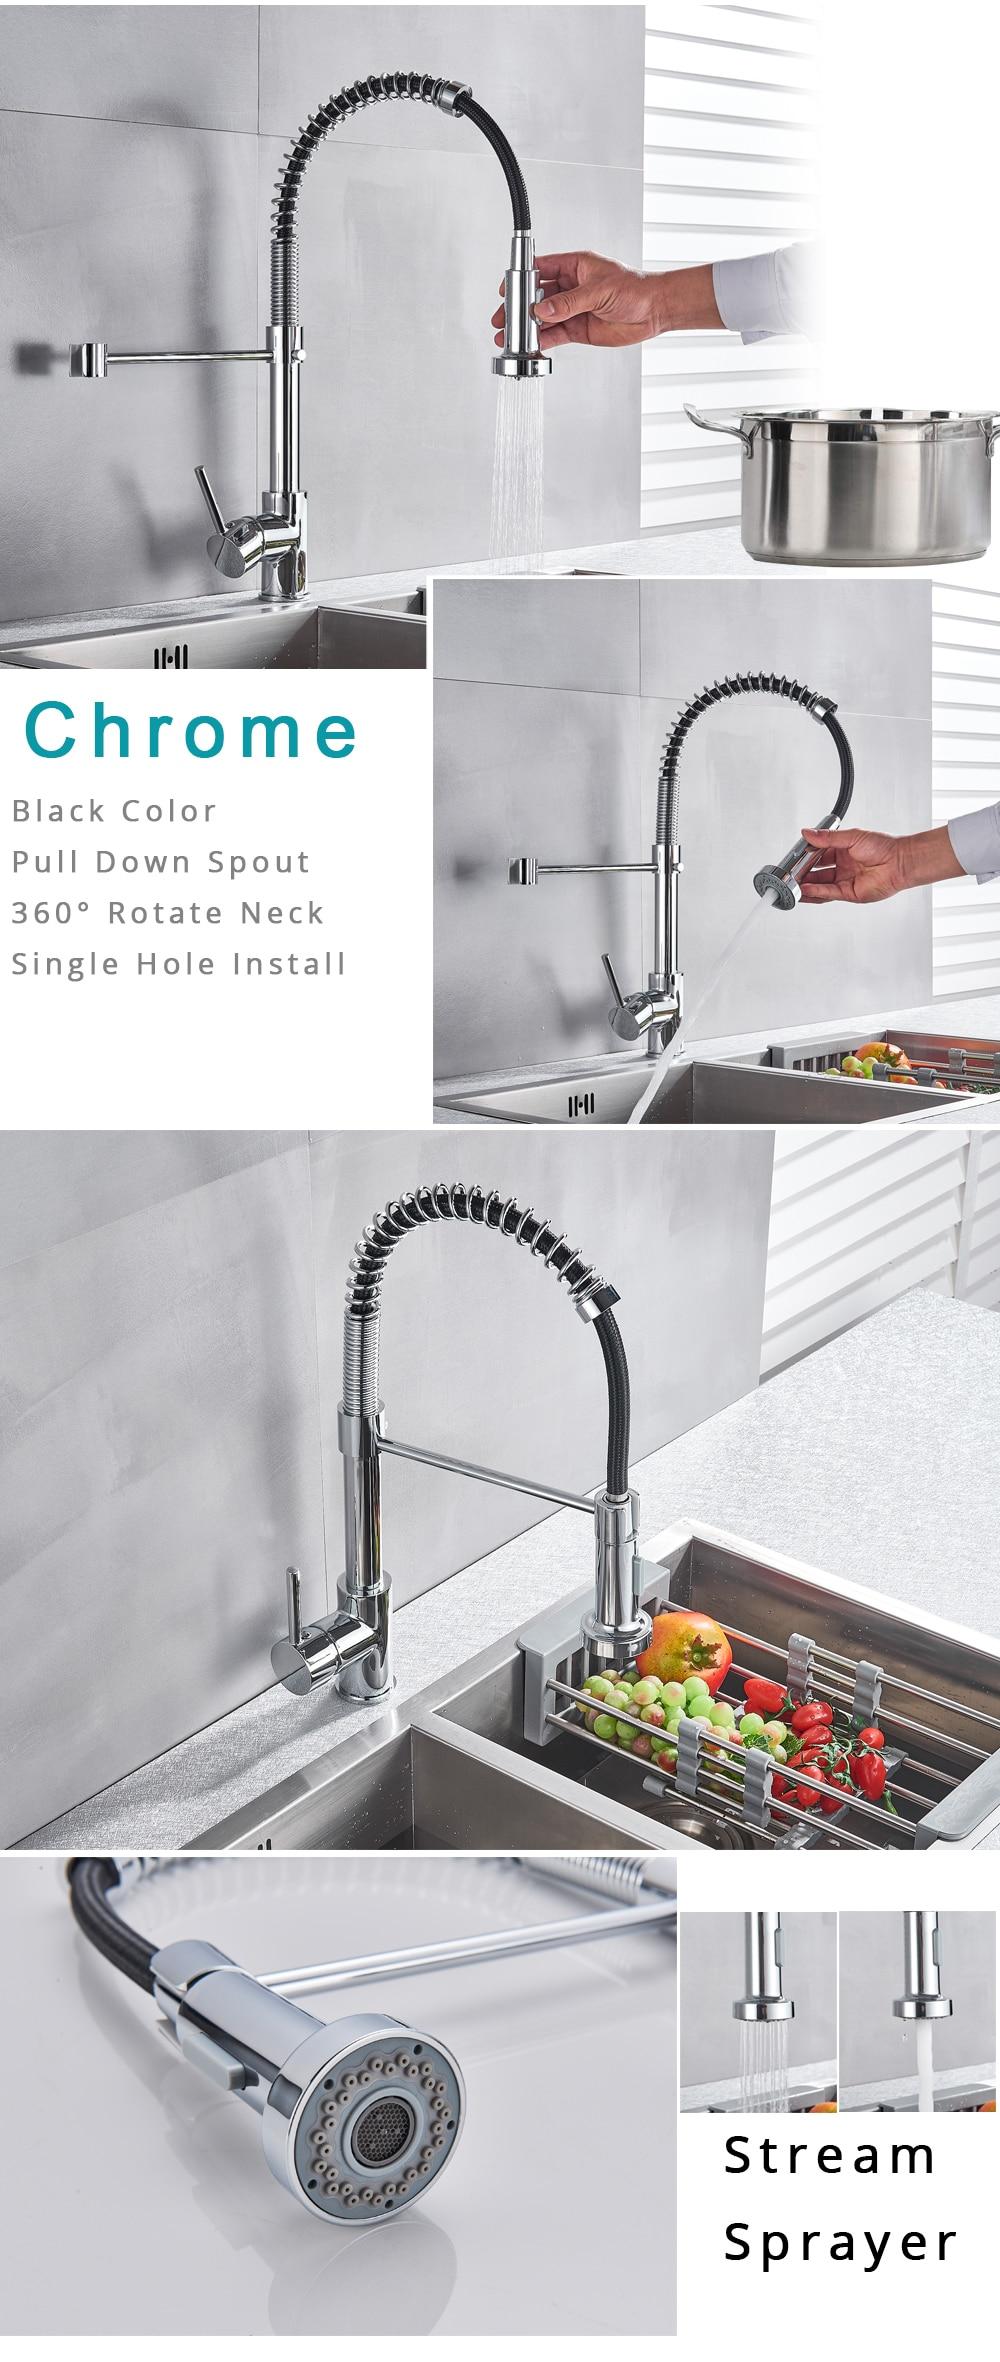 HTB1HfBYXfb2gK0jSZK9q6yEgFXa6 Rozin Matte Black Kitchen Faucet Deck Mounted Mixer Tap 360 Degree Rotation Stream Sprayer Nozzle Kitchen Sink Hot Cold Taps